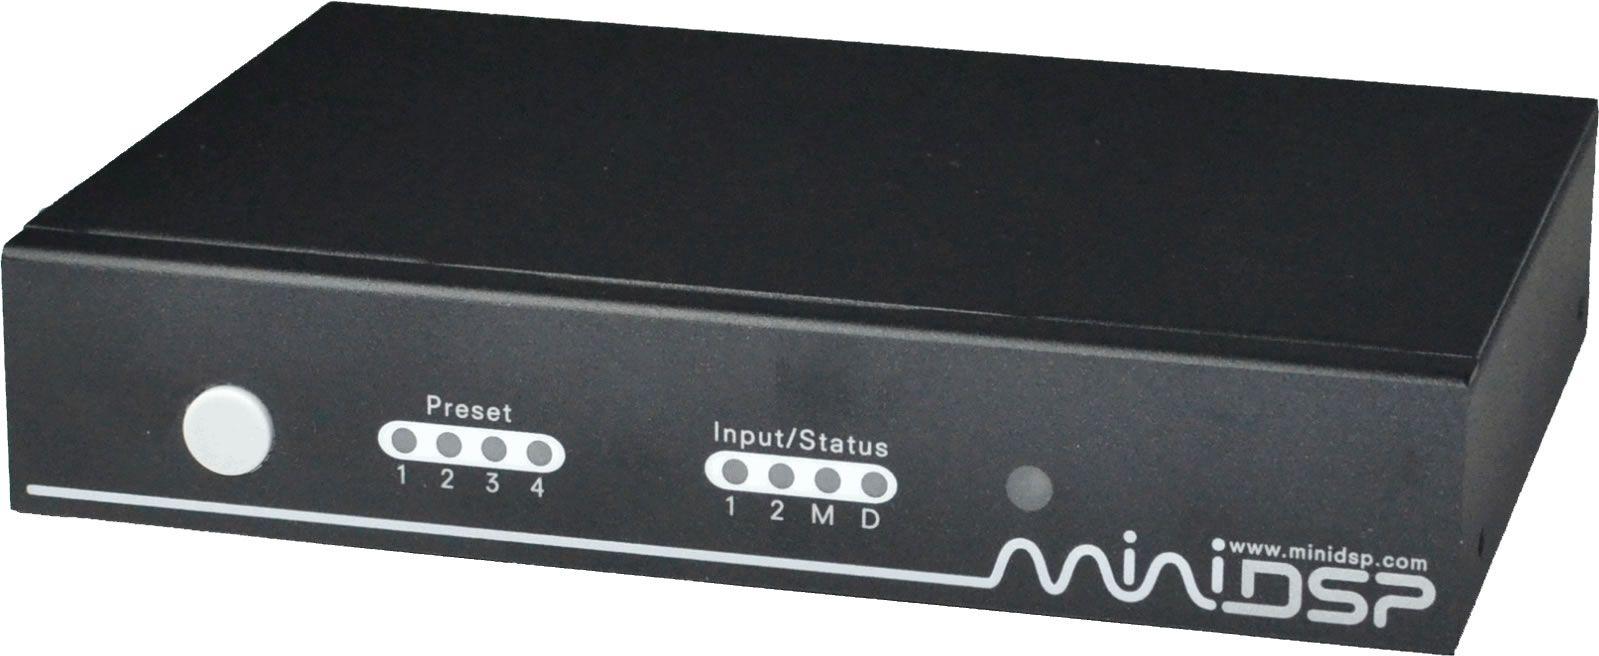 minidsp Nano AVR HD 7.1 HDMI digital romkorreksjon